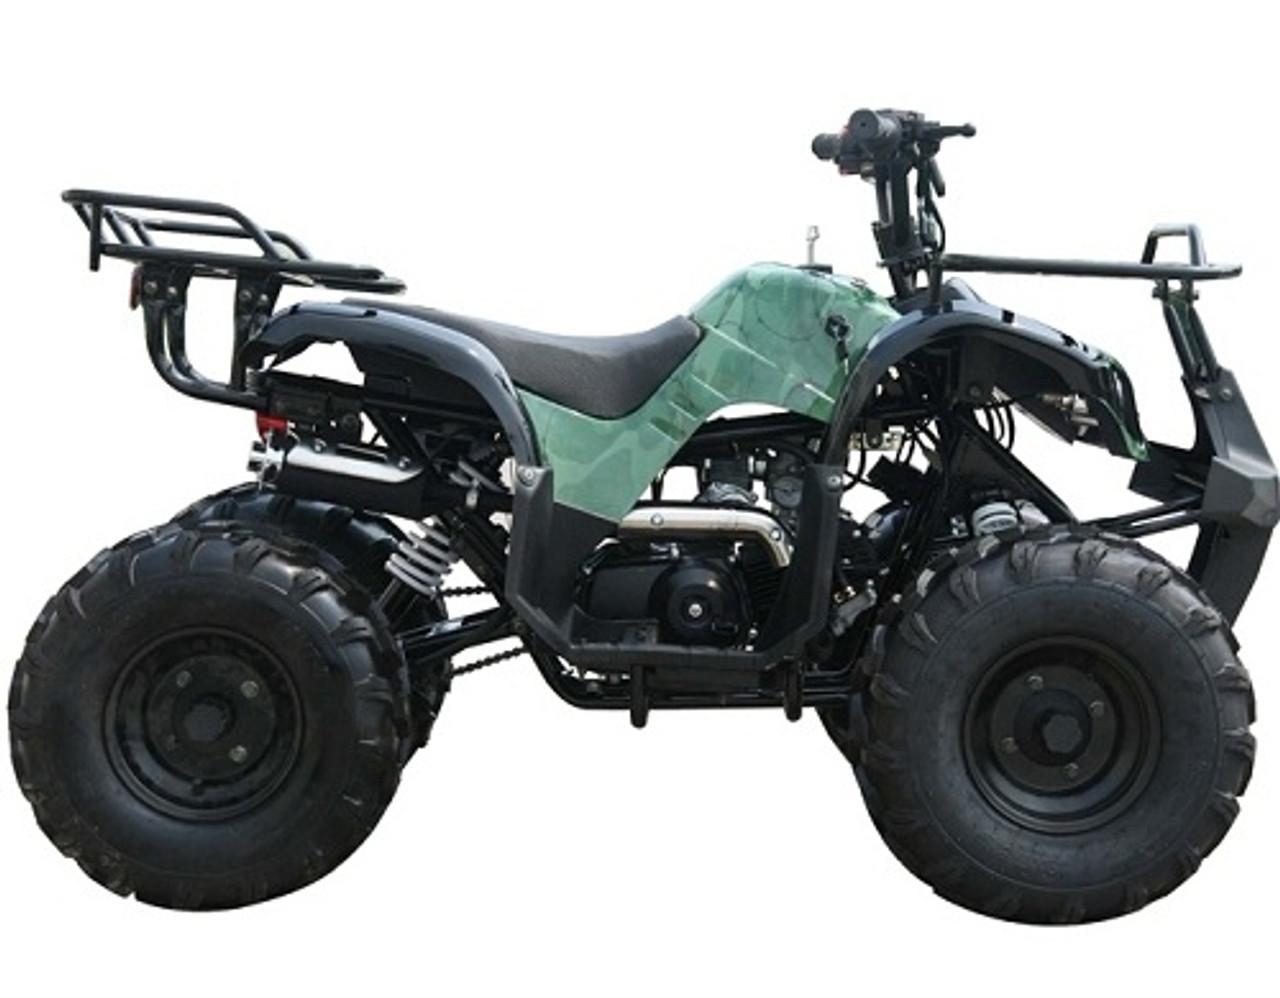 Assembled-Kodiak-hd 125cc mid size atv with reverse